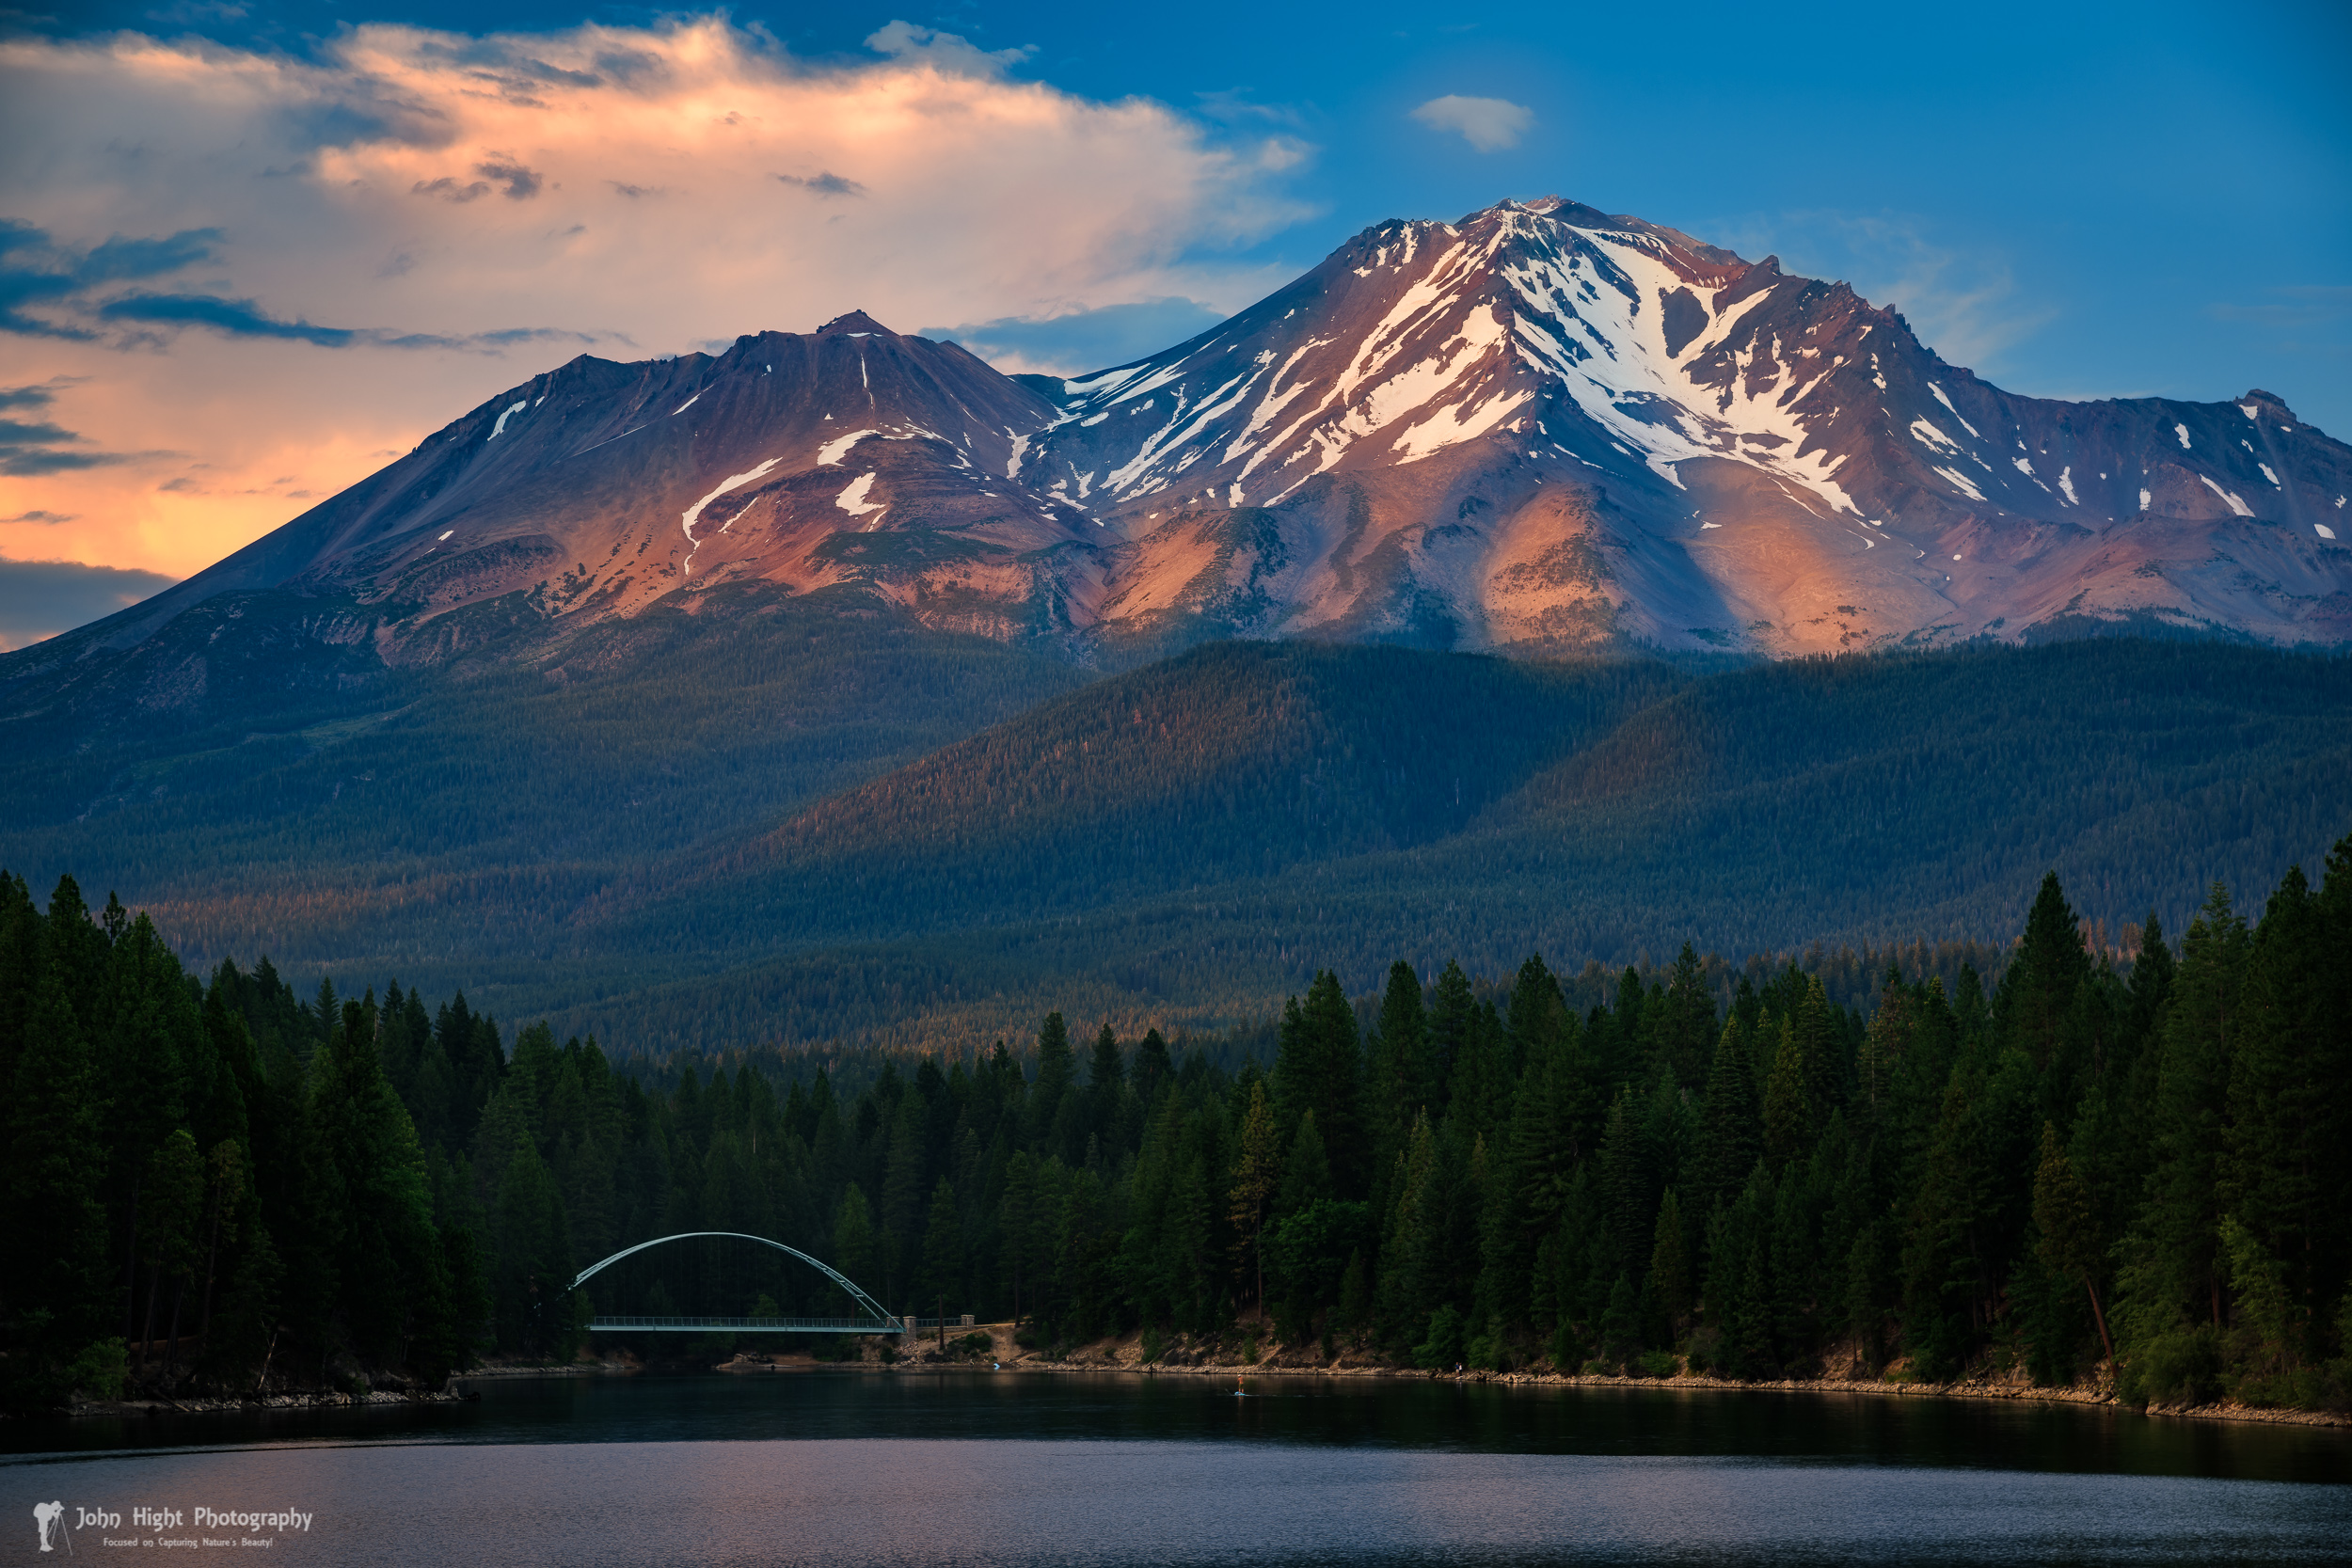 Dappled Light on Mount Shasta